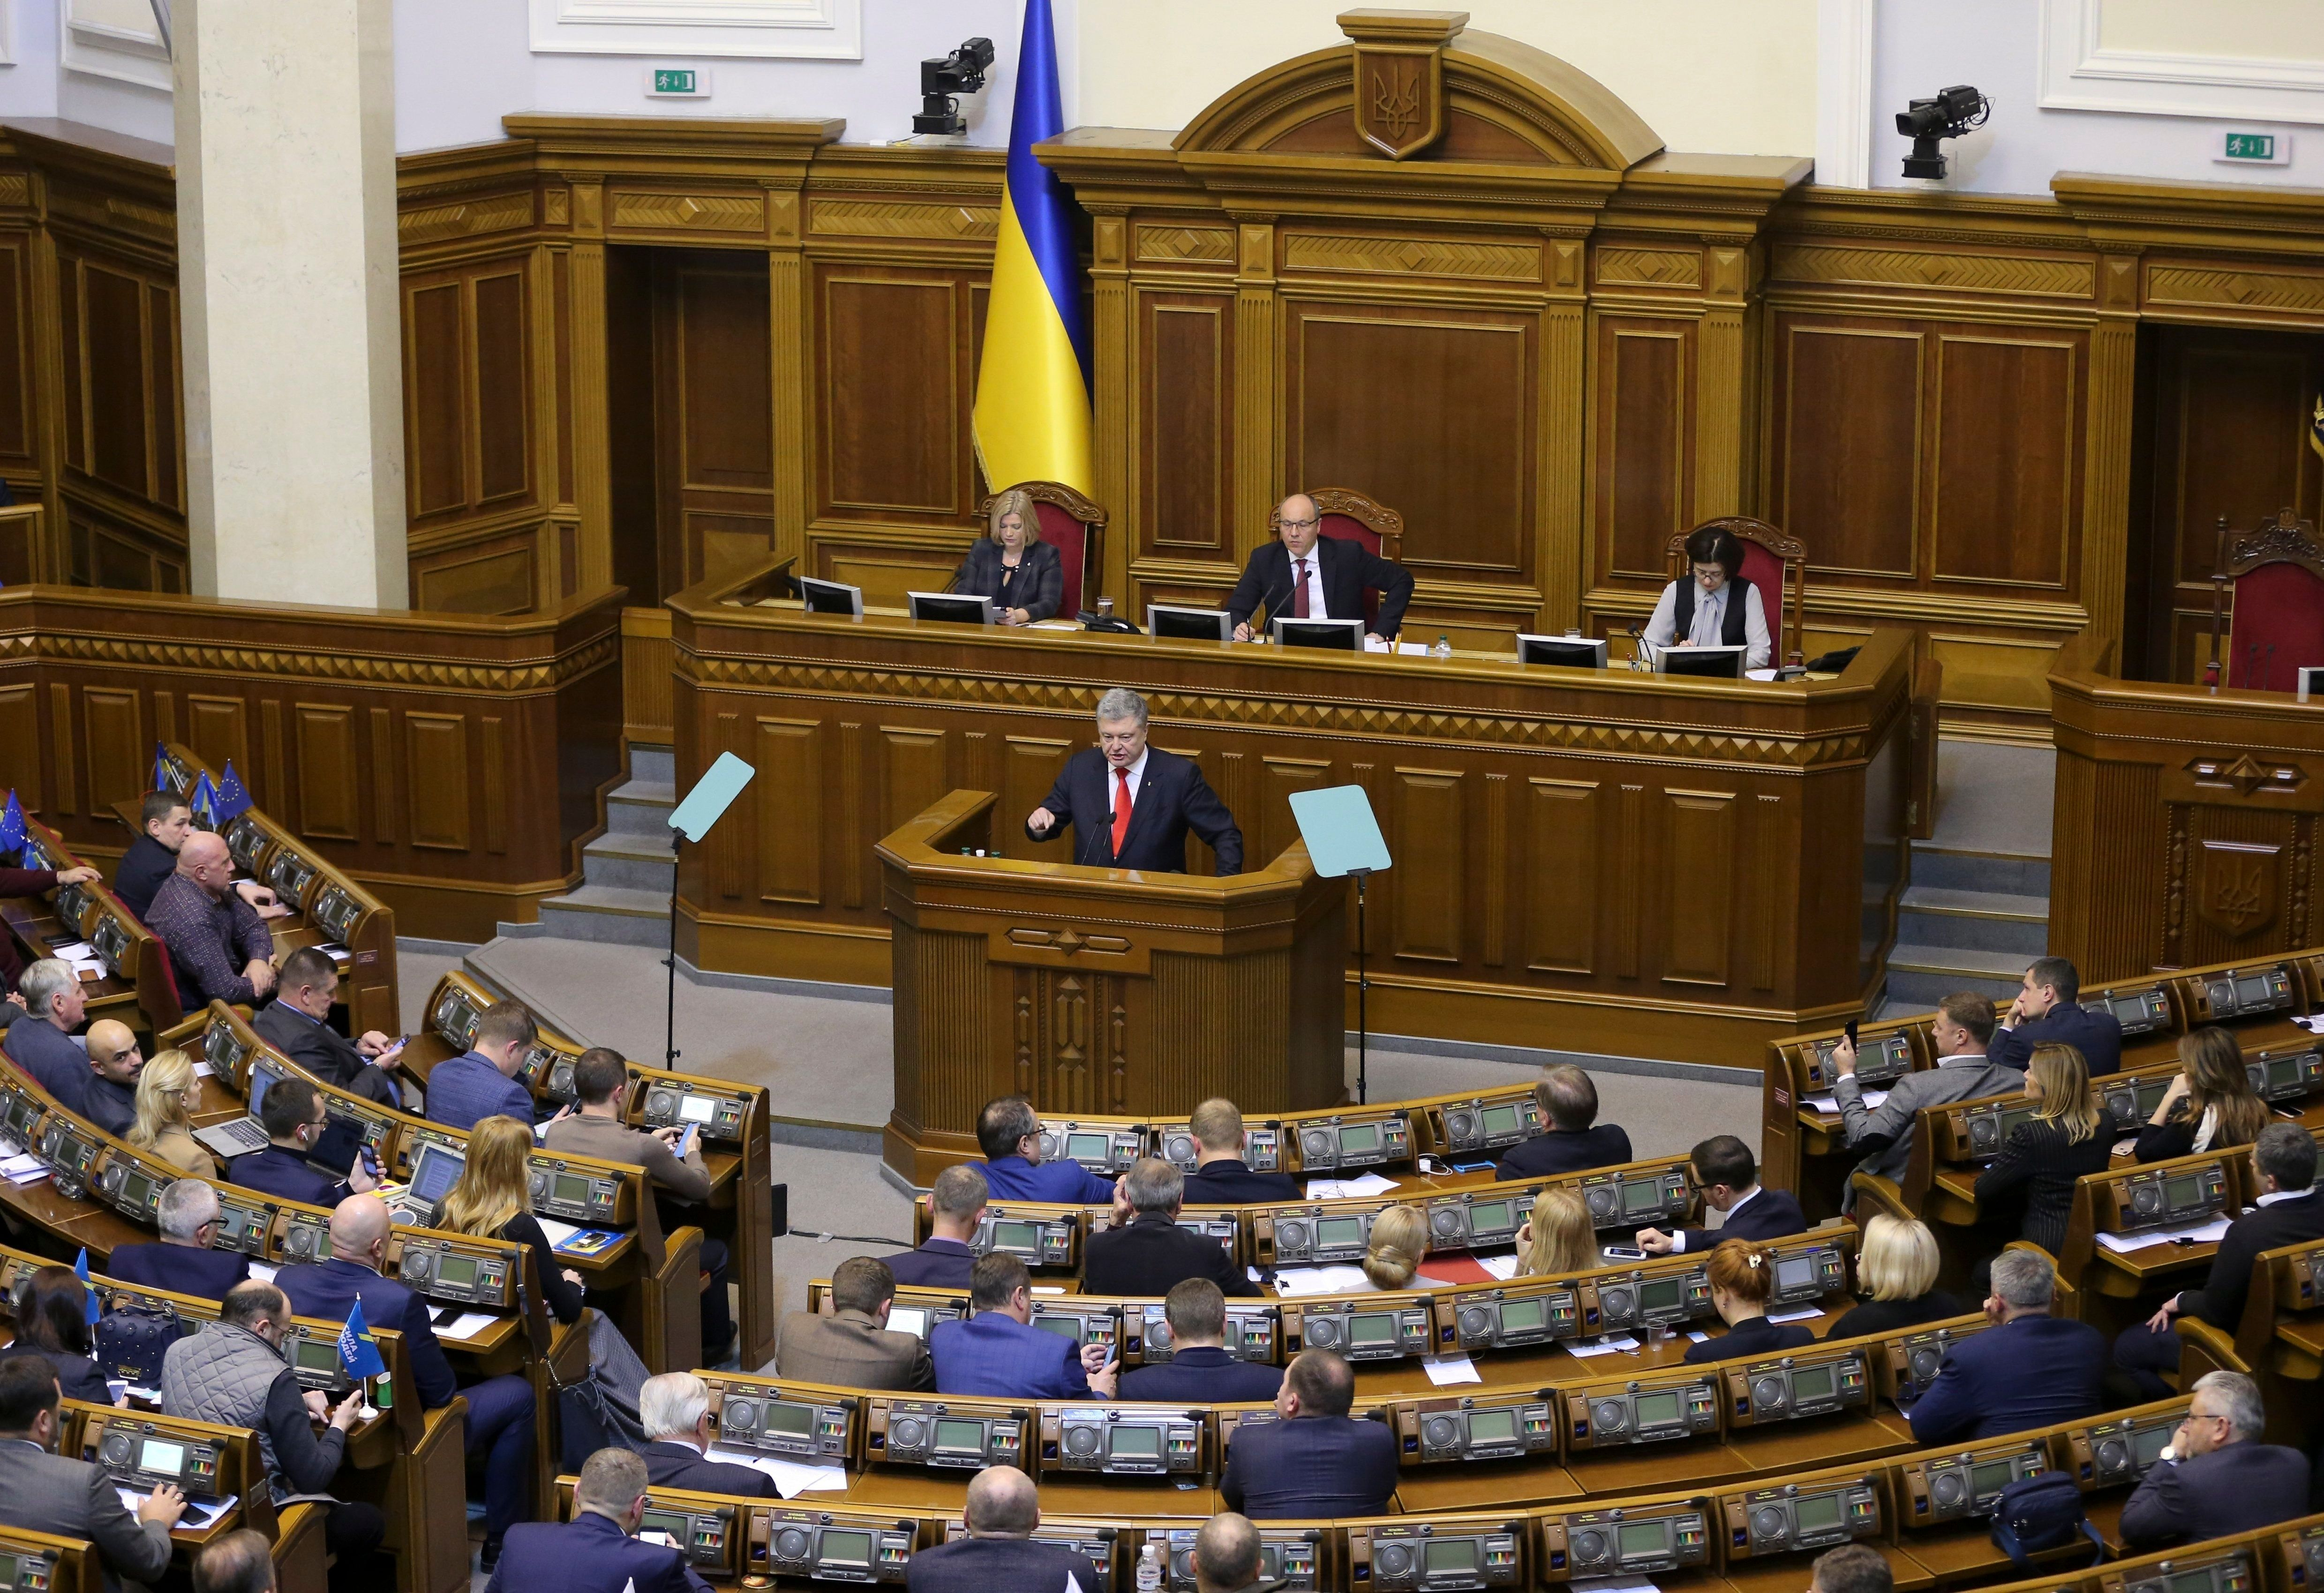 President Petro Poroshenko addresses the Ukrainian parliament